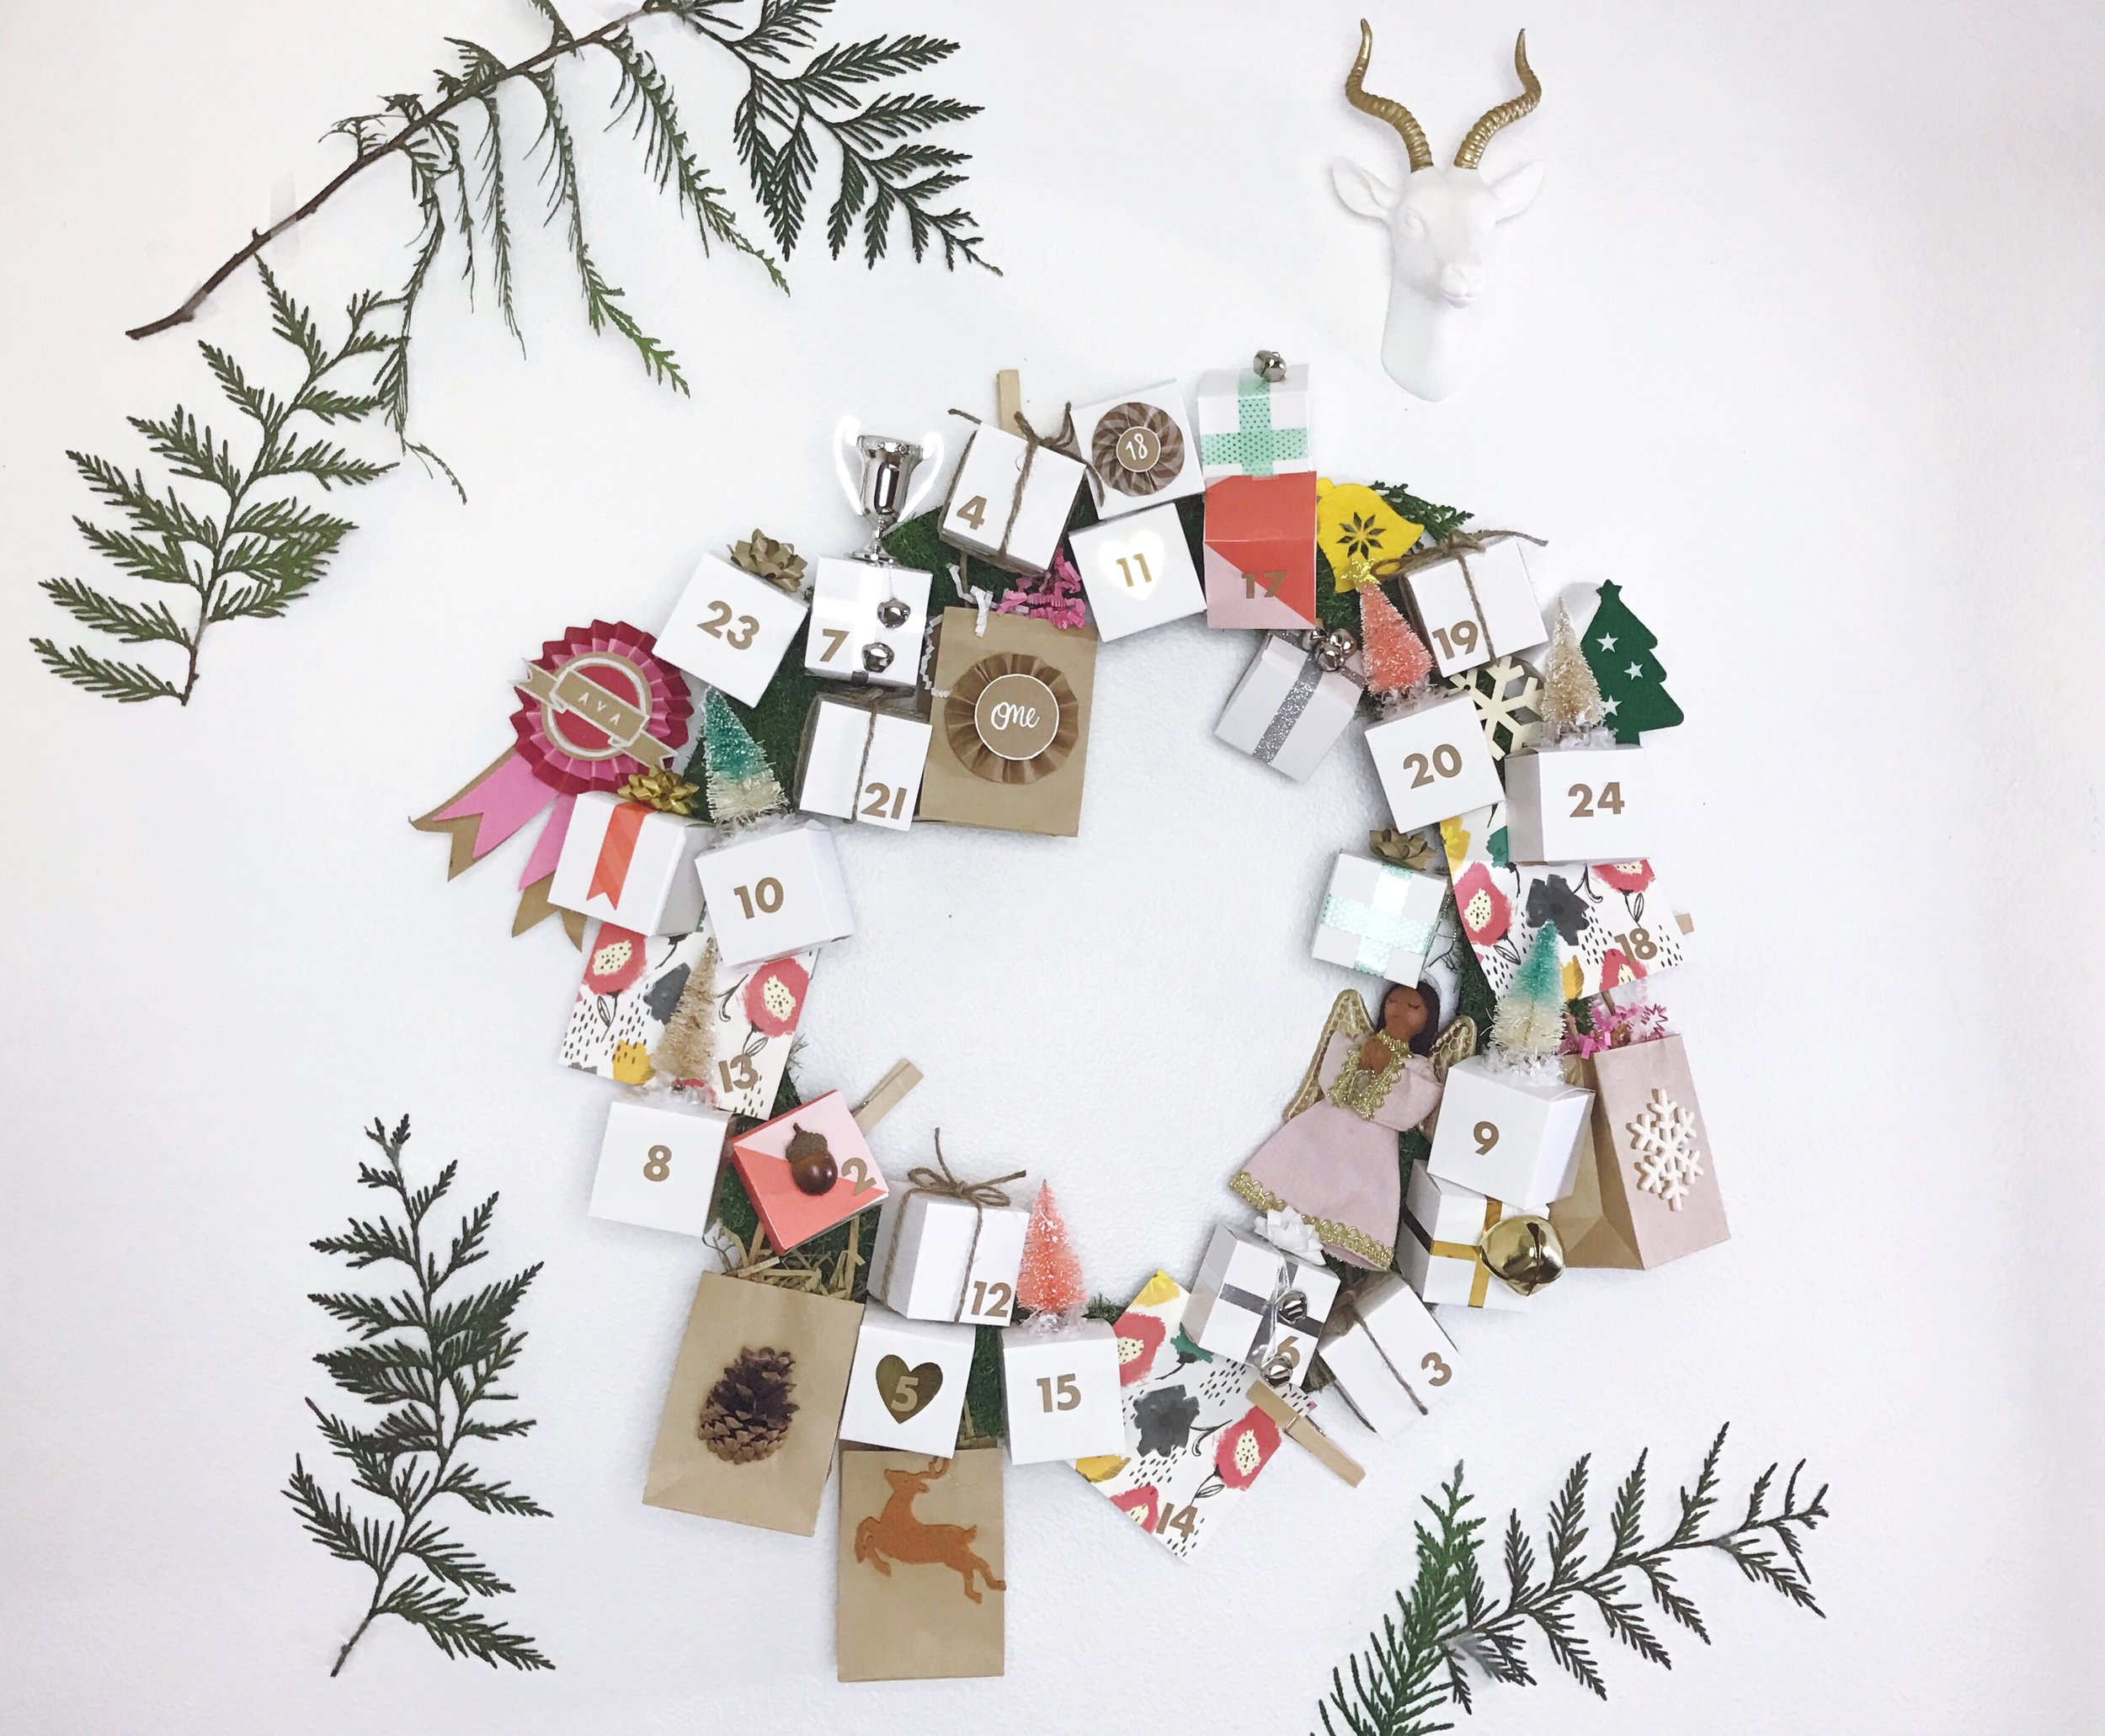 Original_Marabou-Design-Advent-Calendar-Beauty-1.JPG